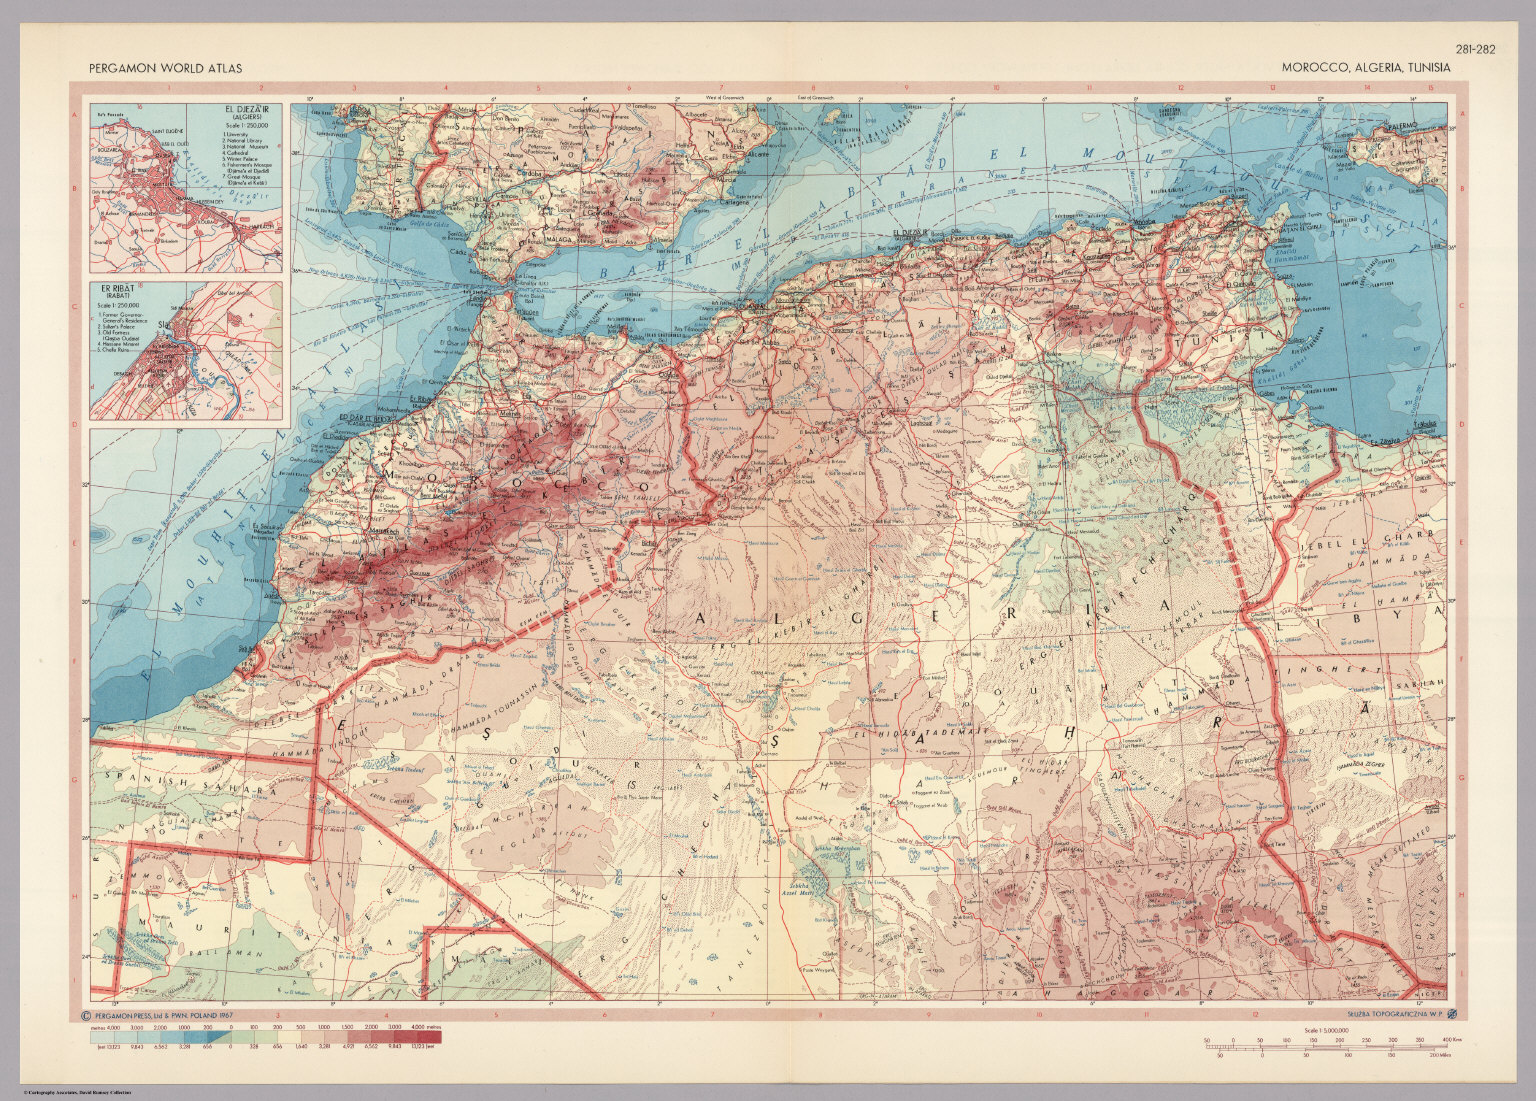 Morocco, Algeria, Tunisia. Pergamon World Atlas. - David Rumsey ...